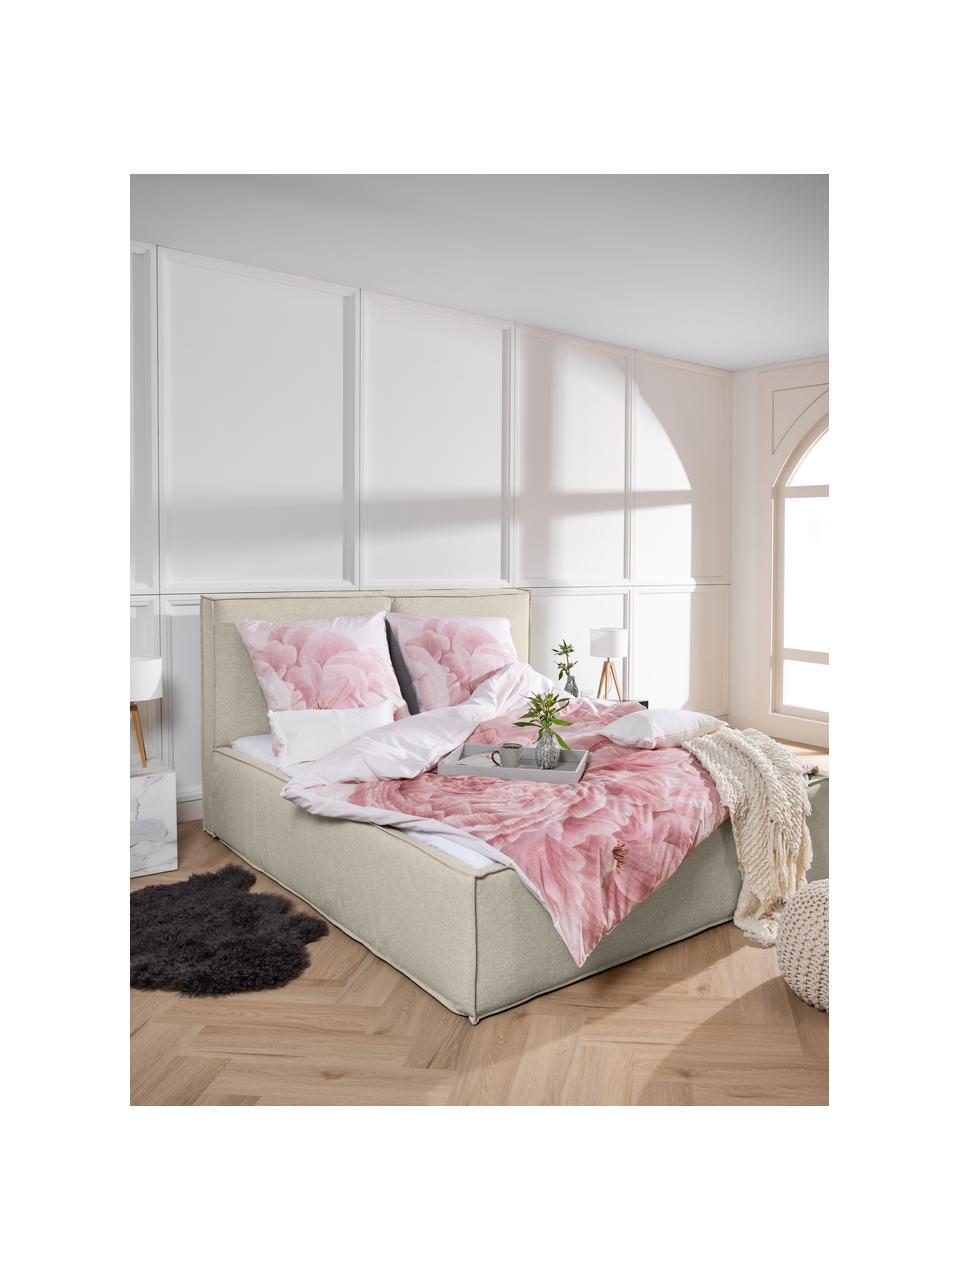 Łózko tapicerowane Dream, Korpus: Lite drewno sosnowe i mat, Tapicerka: 100% poliester (tkanina s, Taupe, S 180 x D 200 cm